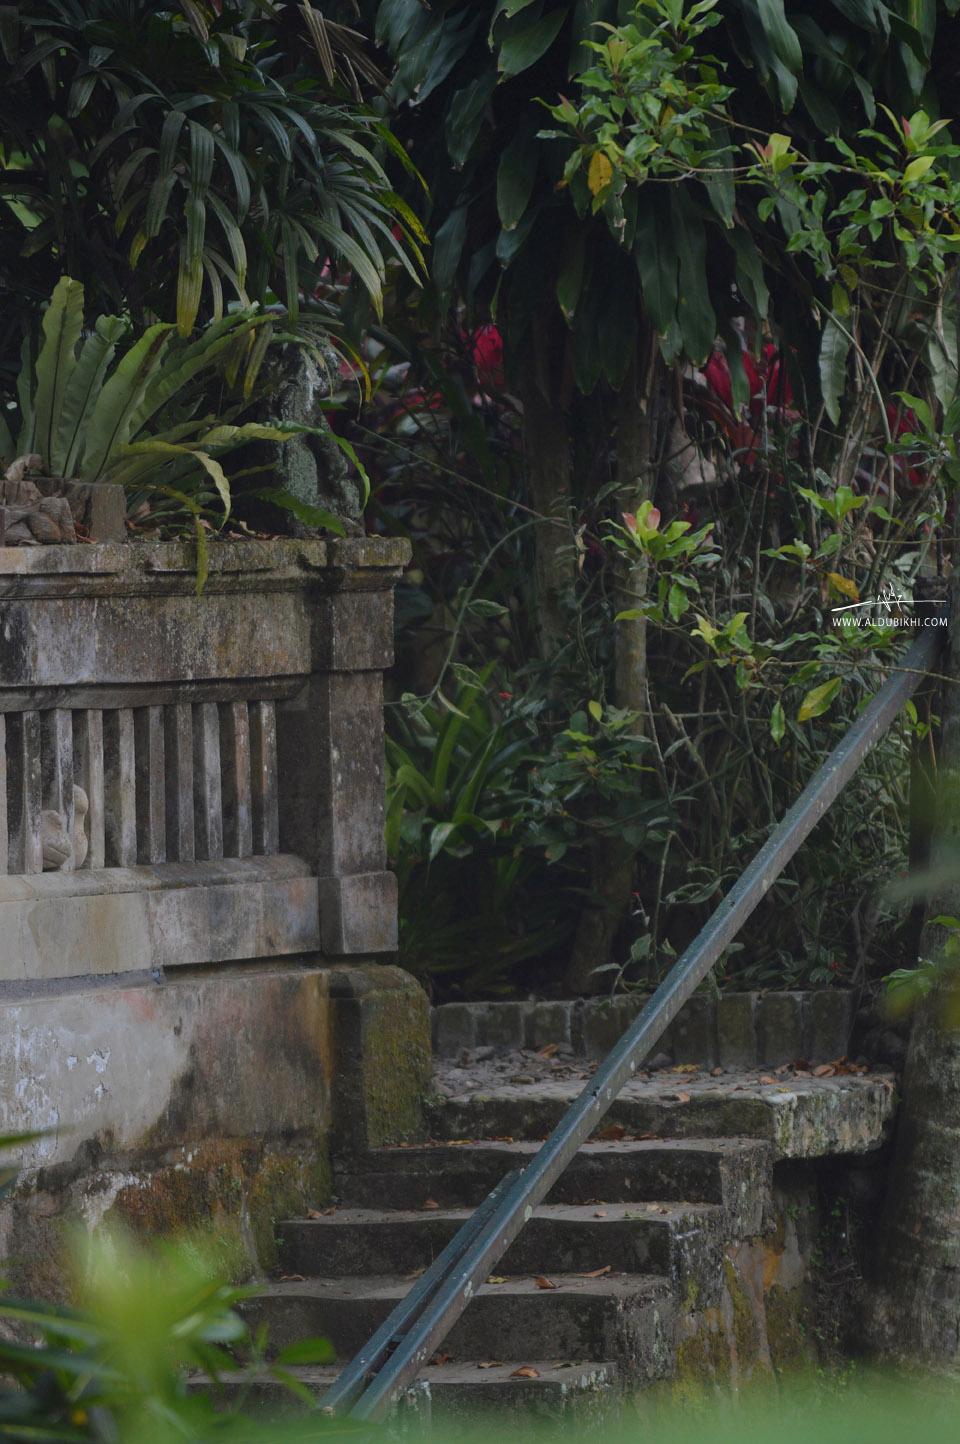 bali accommodation , bali airport , bali hotels , bali indonesia tourism , bally island , hotel bali , hotels in bali , hotels in bali indonesia , اجمل الاماكن في بالي , اجمل الجزر في اندونيسيا , اجمل جزر اندونيسيا , اجمل جزيرة بالعالم , اجمل فنادق بالي , اجواء جزيرة بالي , اسعار الفلل في اندونيسيا , اسعار الفنادق في بالي , اسعار جزيرة بالي , اسواق جزيرة بالي , افضل الاماكن السياحية في بالي , افضل الفنادق في بالي , افضل المنتجعات في جزيرة بالي , افضل جزيرة , افضل جزيرة في العالم , افضل فندق في بالي , الأماكن السياحية في بالي , الاماكن السياحية في جزيرة بالي , الترحال , السفر الى بالي , السفر الى جزيرة بالي , السياح العرب , السياحة في , السياحة في اندونيسيا المسافرون العرب , السياحة في بالي , السياحة في بالي بالصور , السياحة في جزيرة بالي , السياحة في جزيرة بالي الاندونيسية , الفلل في اندونيسيا ,  الفنادق في بالي , المسافرون العرب , المسافرون العرب بالي , المسافرون العرب جزيرة بالي , اماكن سياحية في بالي , اندونيسيا جزيرة بالي , اهم المناطق السياحية في بالي , بالي المسافرون العرب , بالي جزيرة الاحلام , بحث عن السياحه , بوكينج جزيرة بالي , تصميم منازل , تقرير جزيرة بالي , تقرير عن بالي , تقرير عن جزيرة بالي , تقرير مصور , جزر اندونيسيا السياحة , جزر اندونيسيا السياحية , جزر اندونيسيا بالصور , جزيرة اندونيسية , جزيرة بالى , جزيرة بالي , جزيرة بالي 2012 , جزيرة بالي 2013 , جزيرة بالي 2014 , جزيرة بالي الاندونيسية , جزيرة بالي العرب المسافرون , جزيرة بالي المسافرون العرب , جزيرة بالي بالصور , جزيرة بالي باندونيسيا , جزيرة بالي تقرير , جزيرة بالي ويكيبيديا , جزيرة بالي يوتيوب , جزيرة باندونيسيا , جزيرة جميلة , جزيرة سياحية , جزيره بالي اندونيسيا , جزيره بالي في اندونيسيا , جواز سفر , خريطة جزيرة بالي , رحلات جزيرة بالي , رحلات سياحيه , رحلة الى النمسا , رحلة الى جزيرة بالي , سفر , سفر وسياحه , سياحة وفنادق , سياحه , شواطئ جزيرة بالي , صور جزيرة بالي , صور سفر , صور عن الجزر , صور عن المسافرين , صور عن بالي , صور لجزيرة بالي , صور من بالي , صور من جزيرة بالي , صورة للسفر , عاشق الترحال , عروض جزيرة بالي , عروض سفر , عروض شهر العسل , عملة جزيرة بالي , فلل جزيرة بالي , فنادق